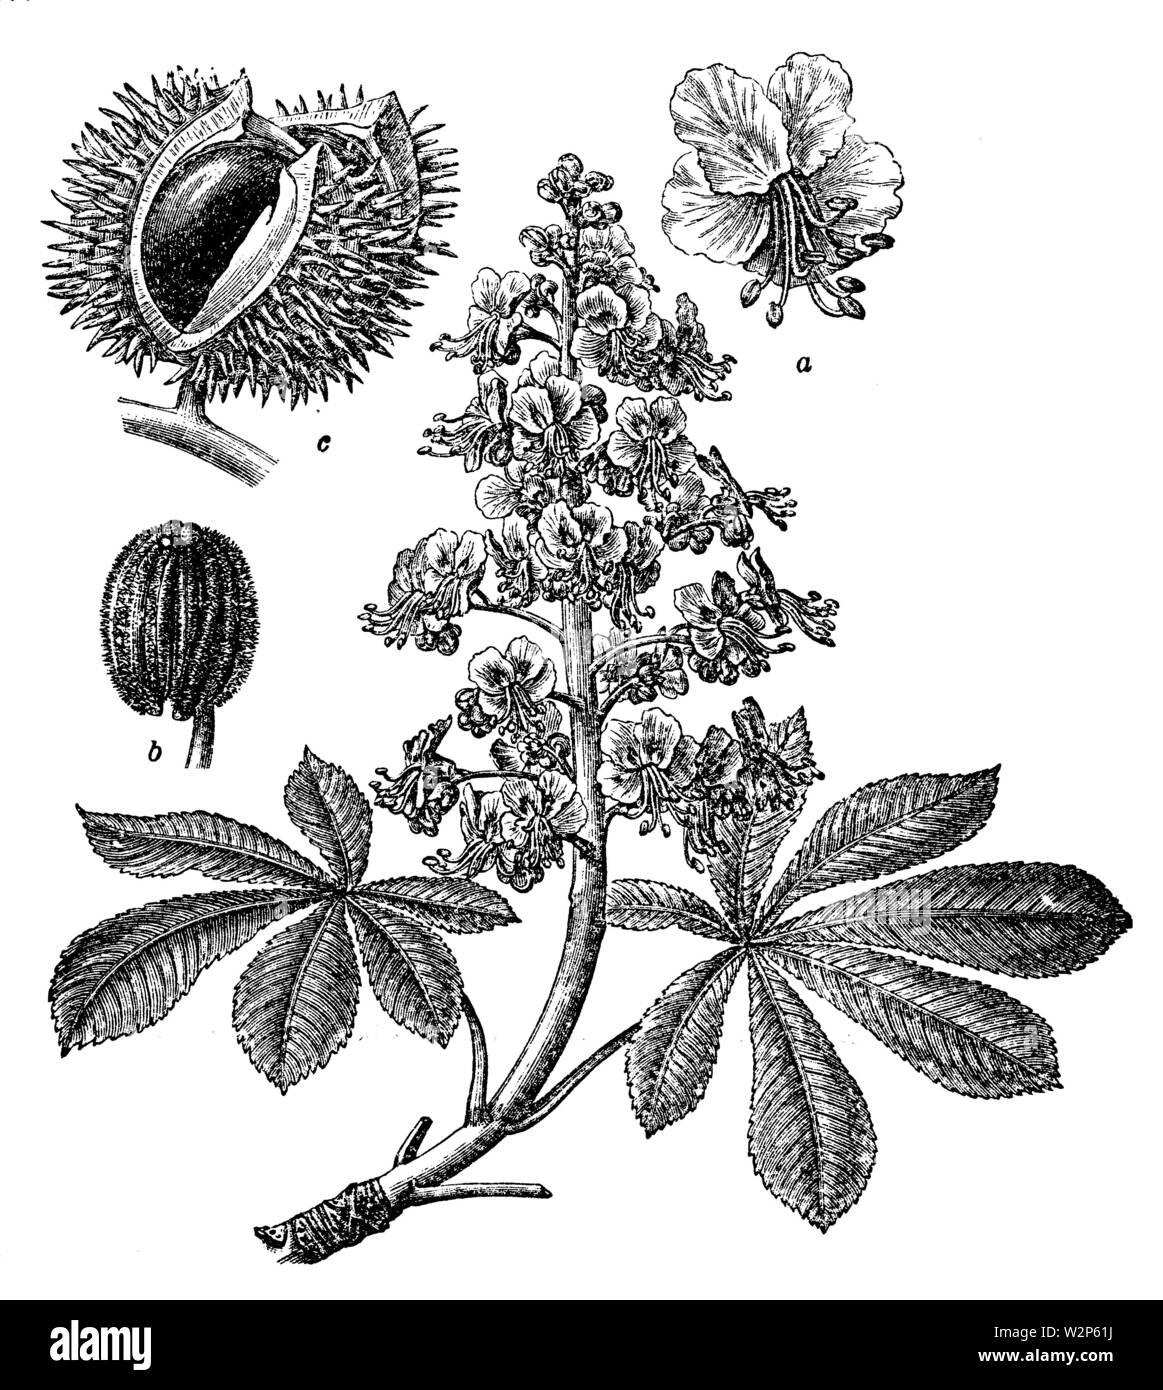 horse-chestnut, conker tree (Aesculus hippocastanum), Aesculus hippocastanum,  (, ) - Stock Image